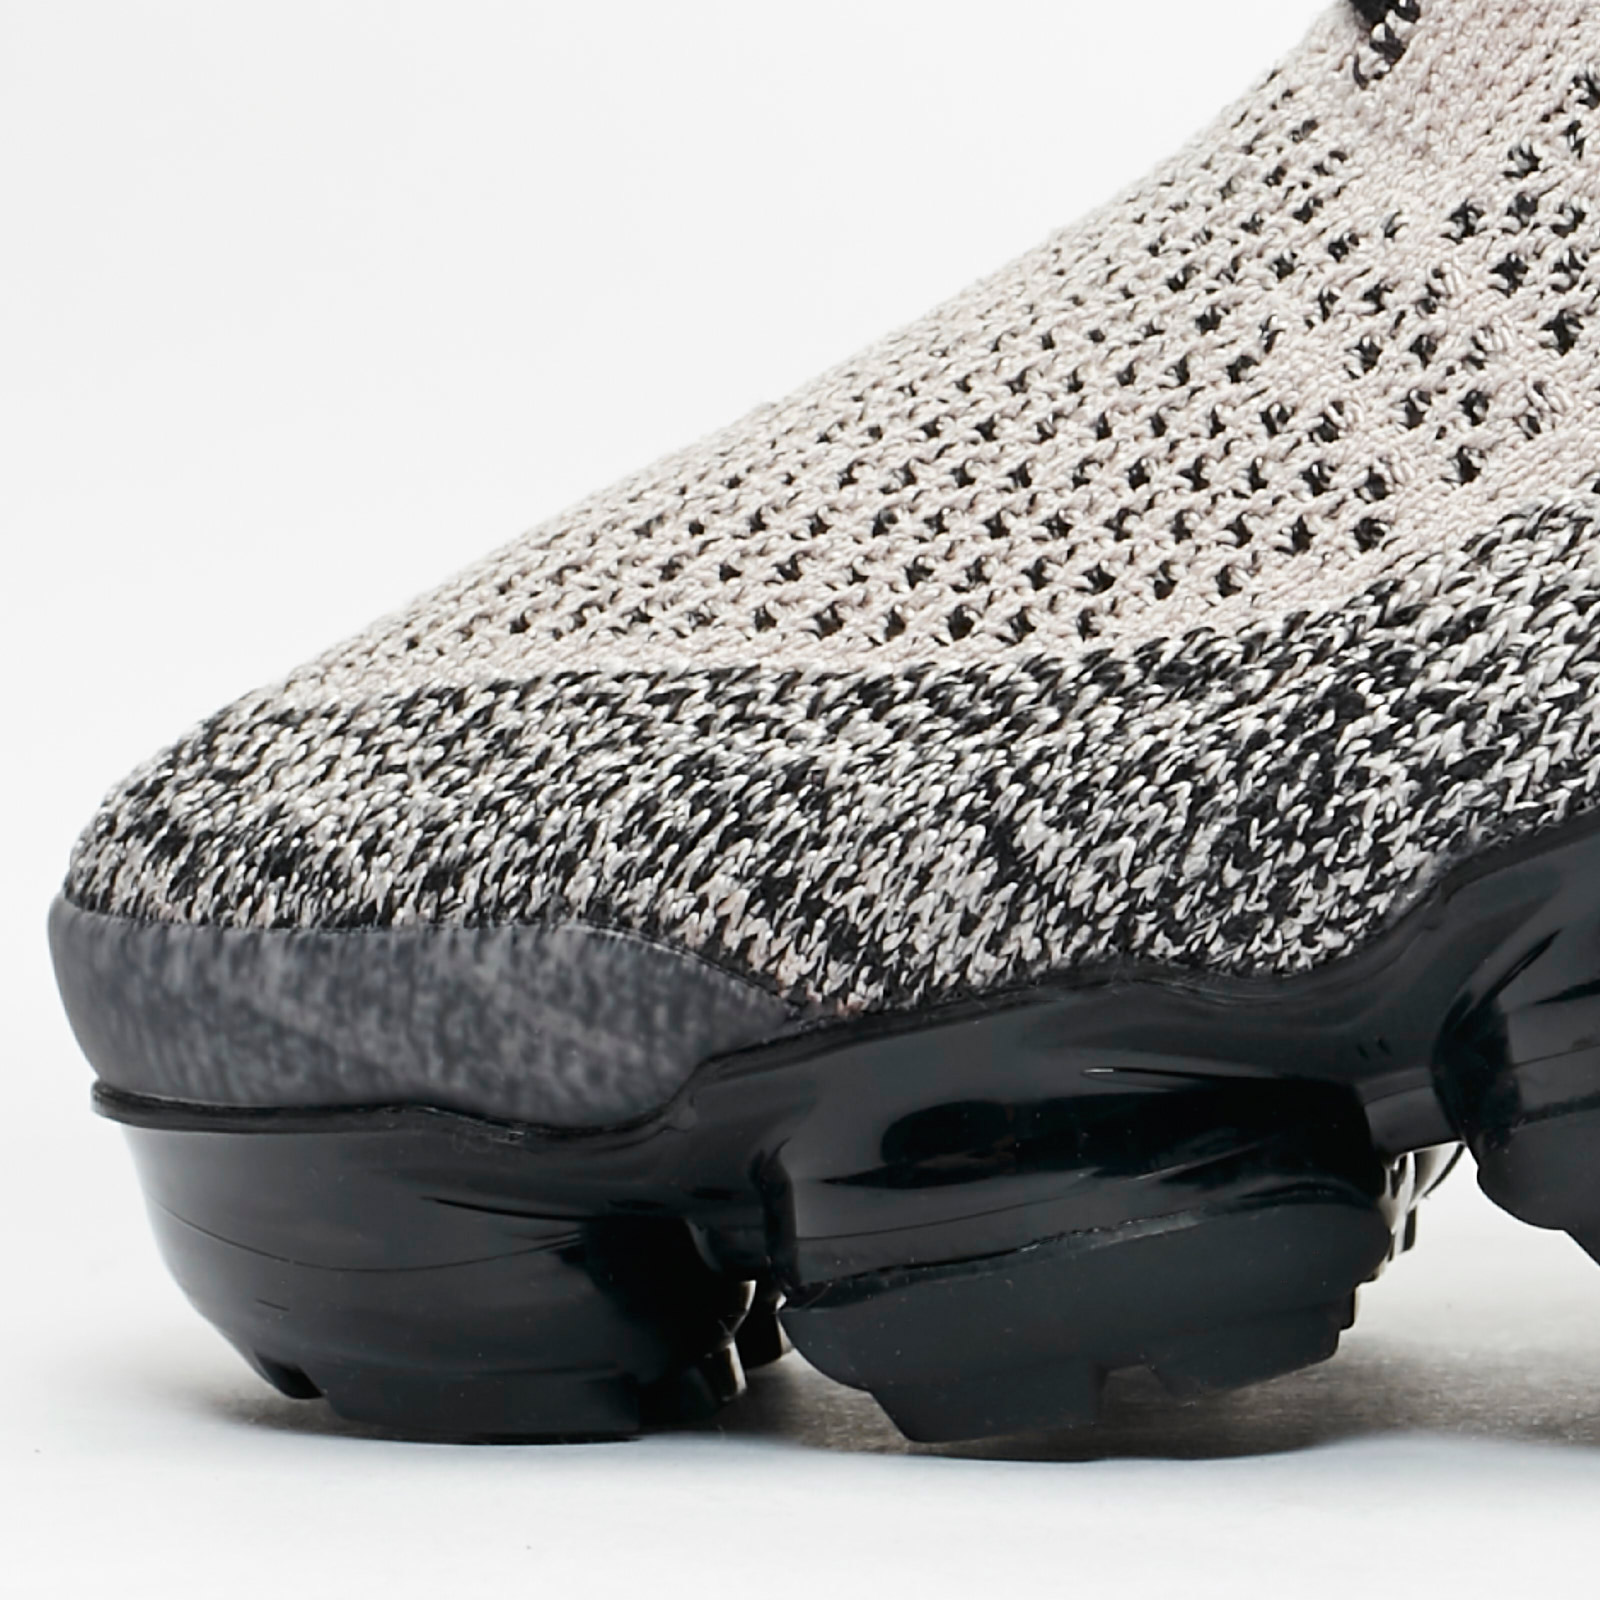 8c02d623e36c Nike Wmns Air Vapormax FK Moc 2 - Aj6599-202 - Sneakersnstuff ...